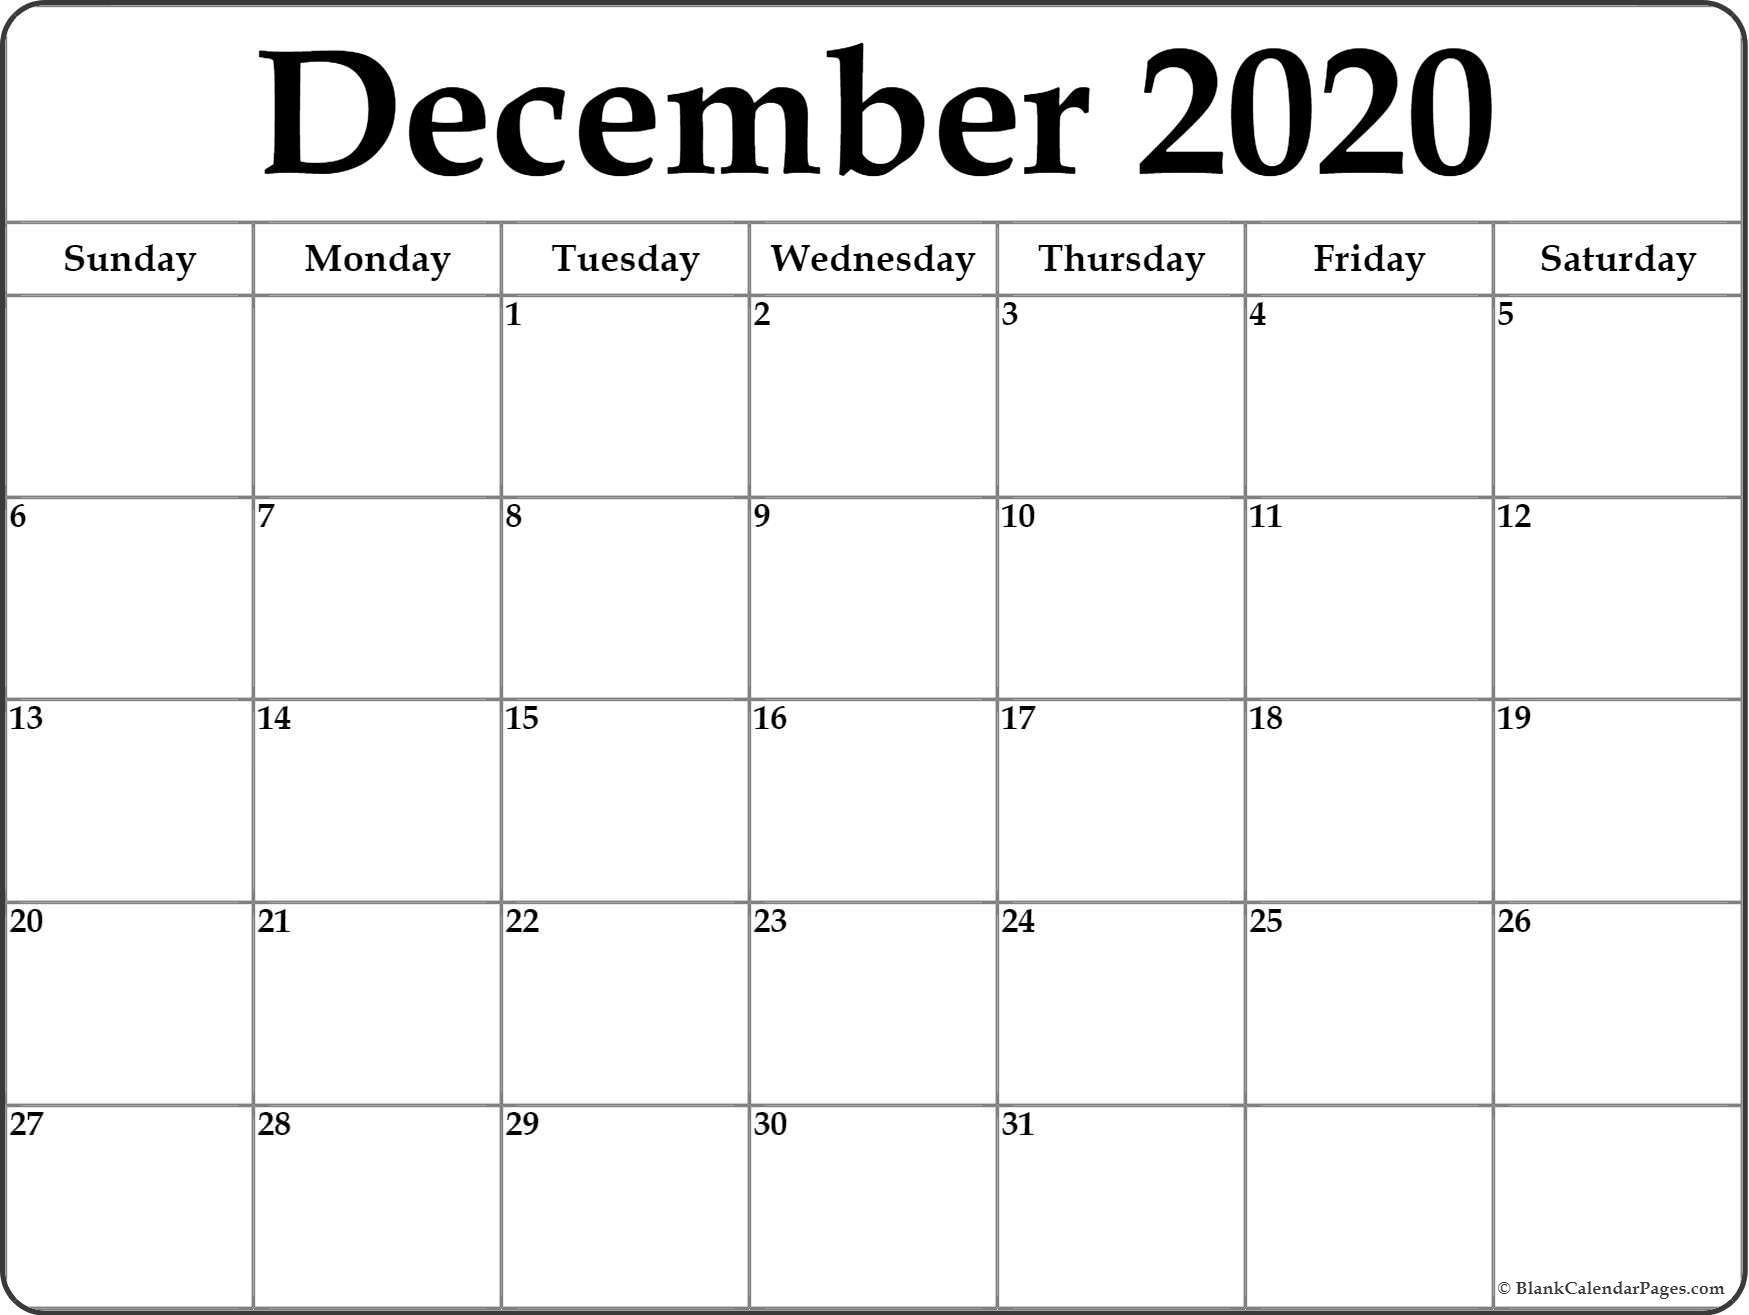 Printable Calendars December 2020 - Togo.wpart.co